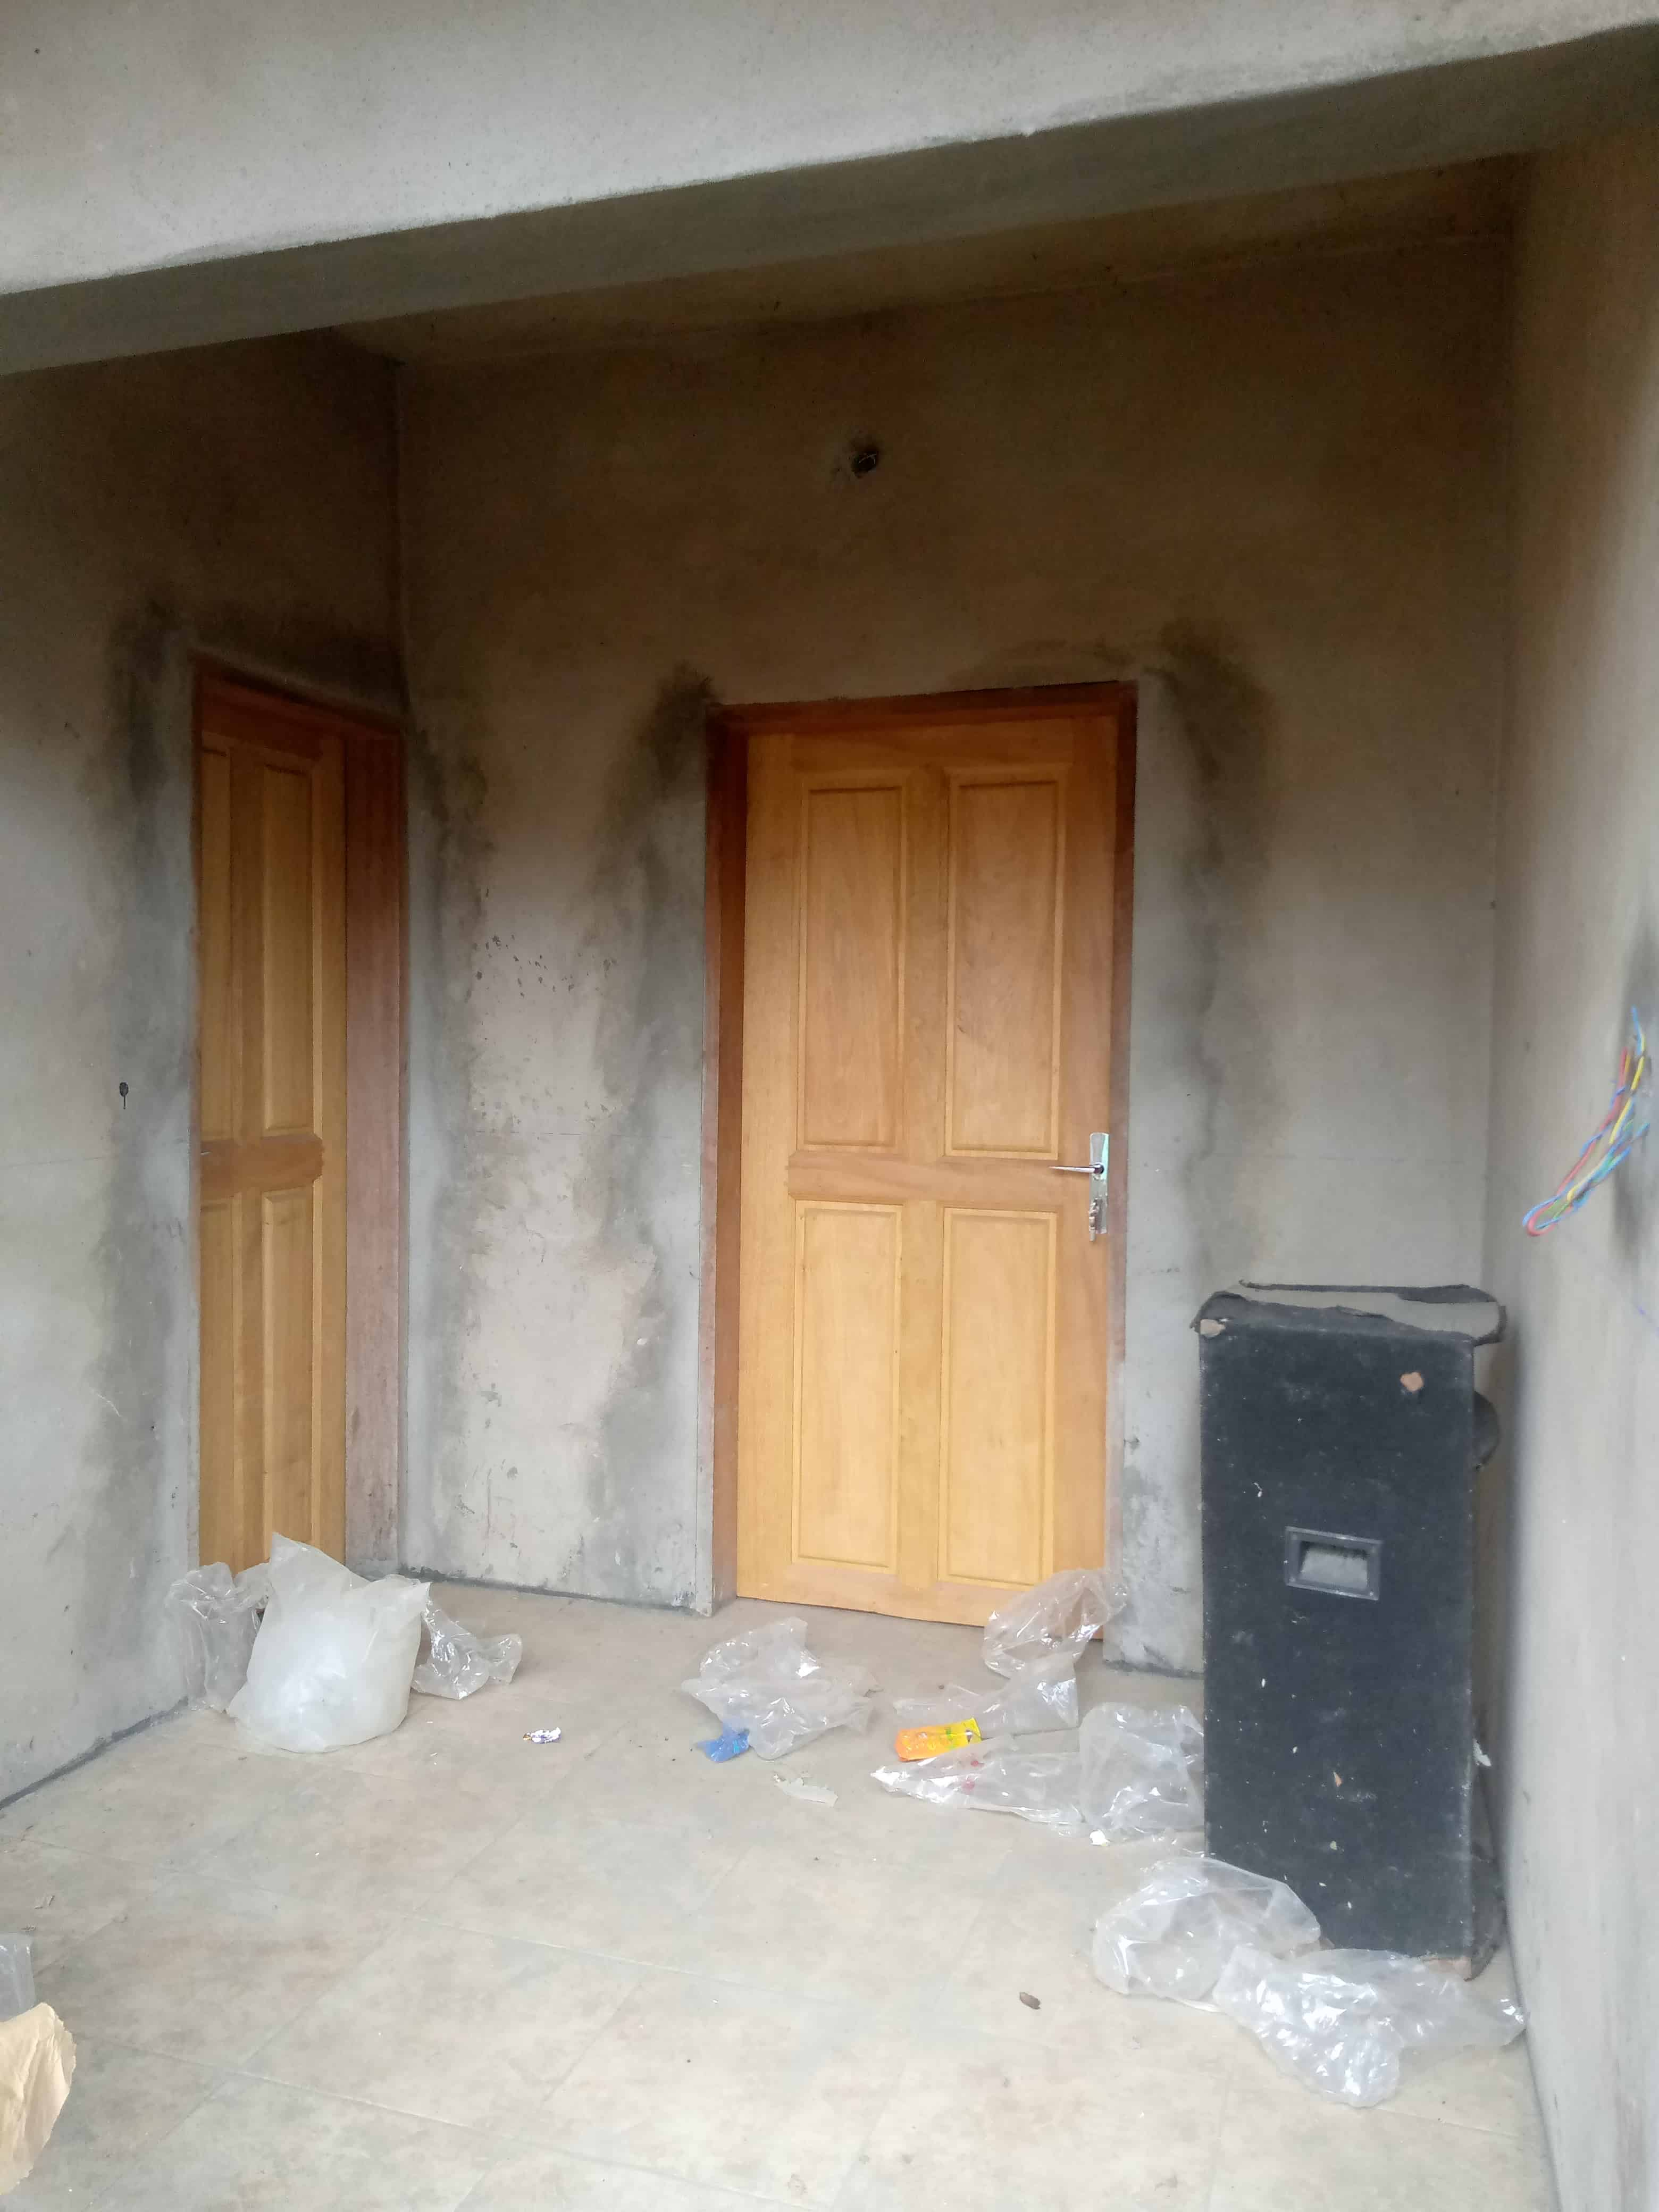 Apartment to rent - Douala, Logpom, Environs de la chefferie - 1 living room(s), 2 bedroom(s), 1 bathroom(s) - 90 000 FCFA / month